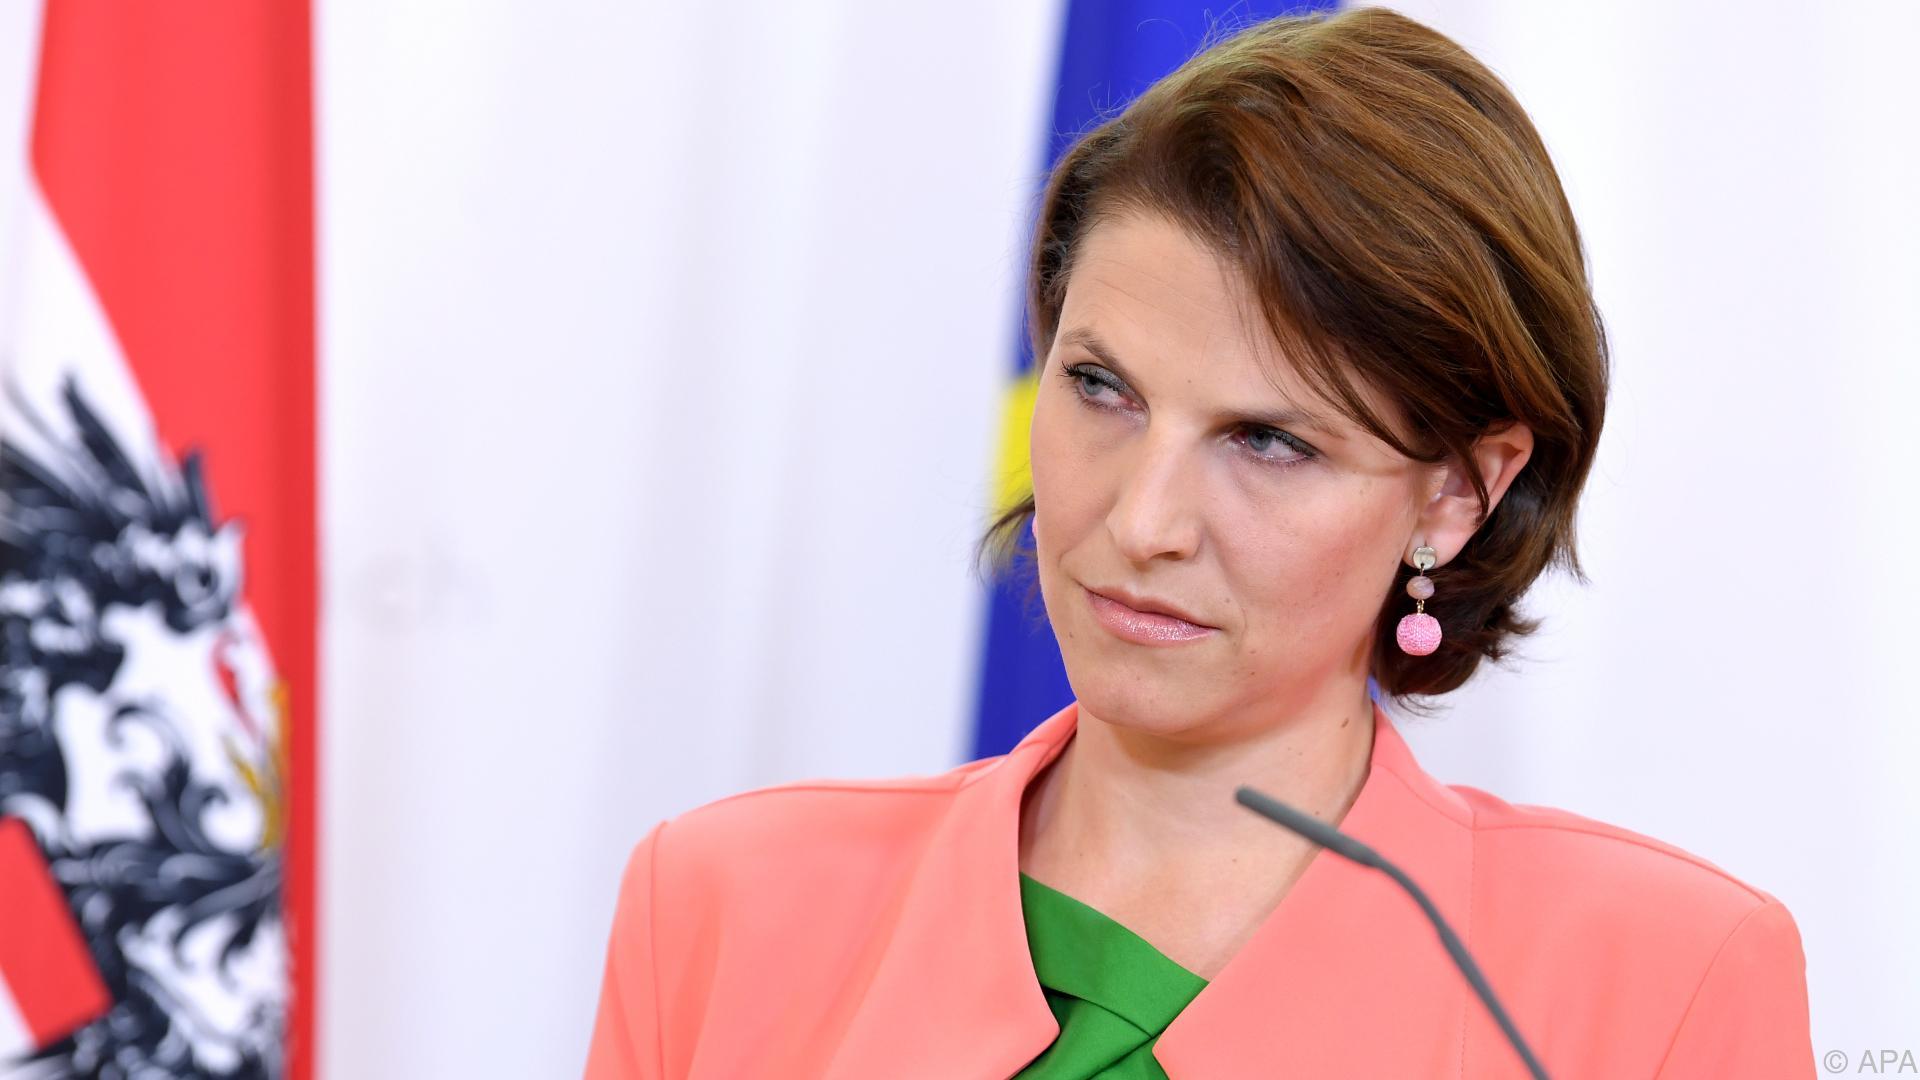 Coronavirus: Edtstadler nach Fall im Kabinett in Heimquarantäne